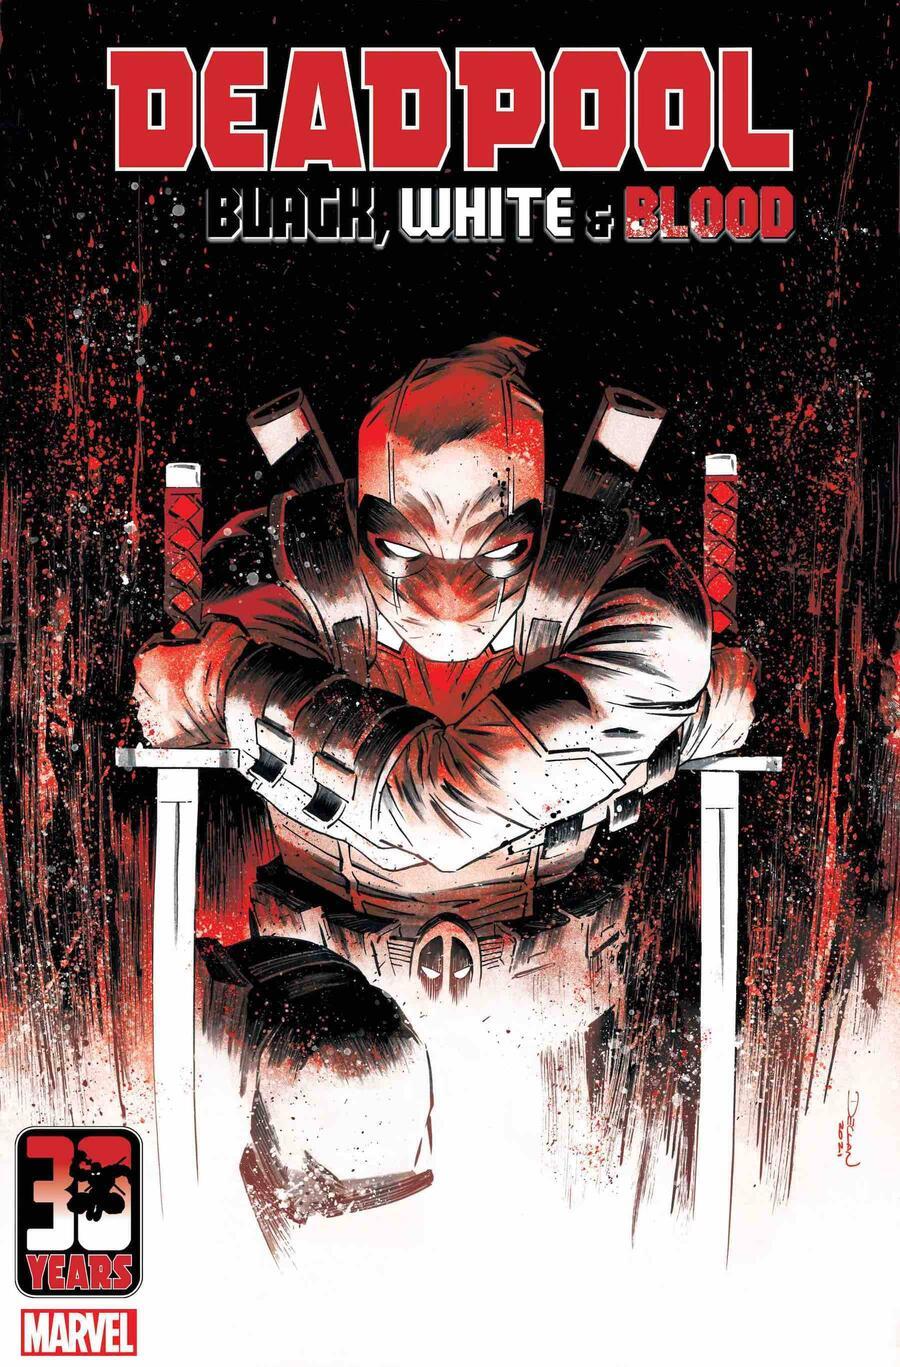 Deadpool: Black, White & Blood, copertina di Declan Shalvey